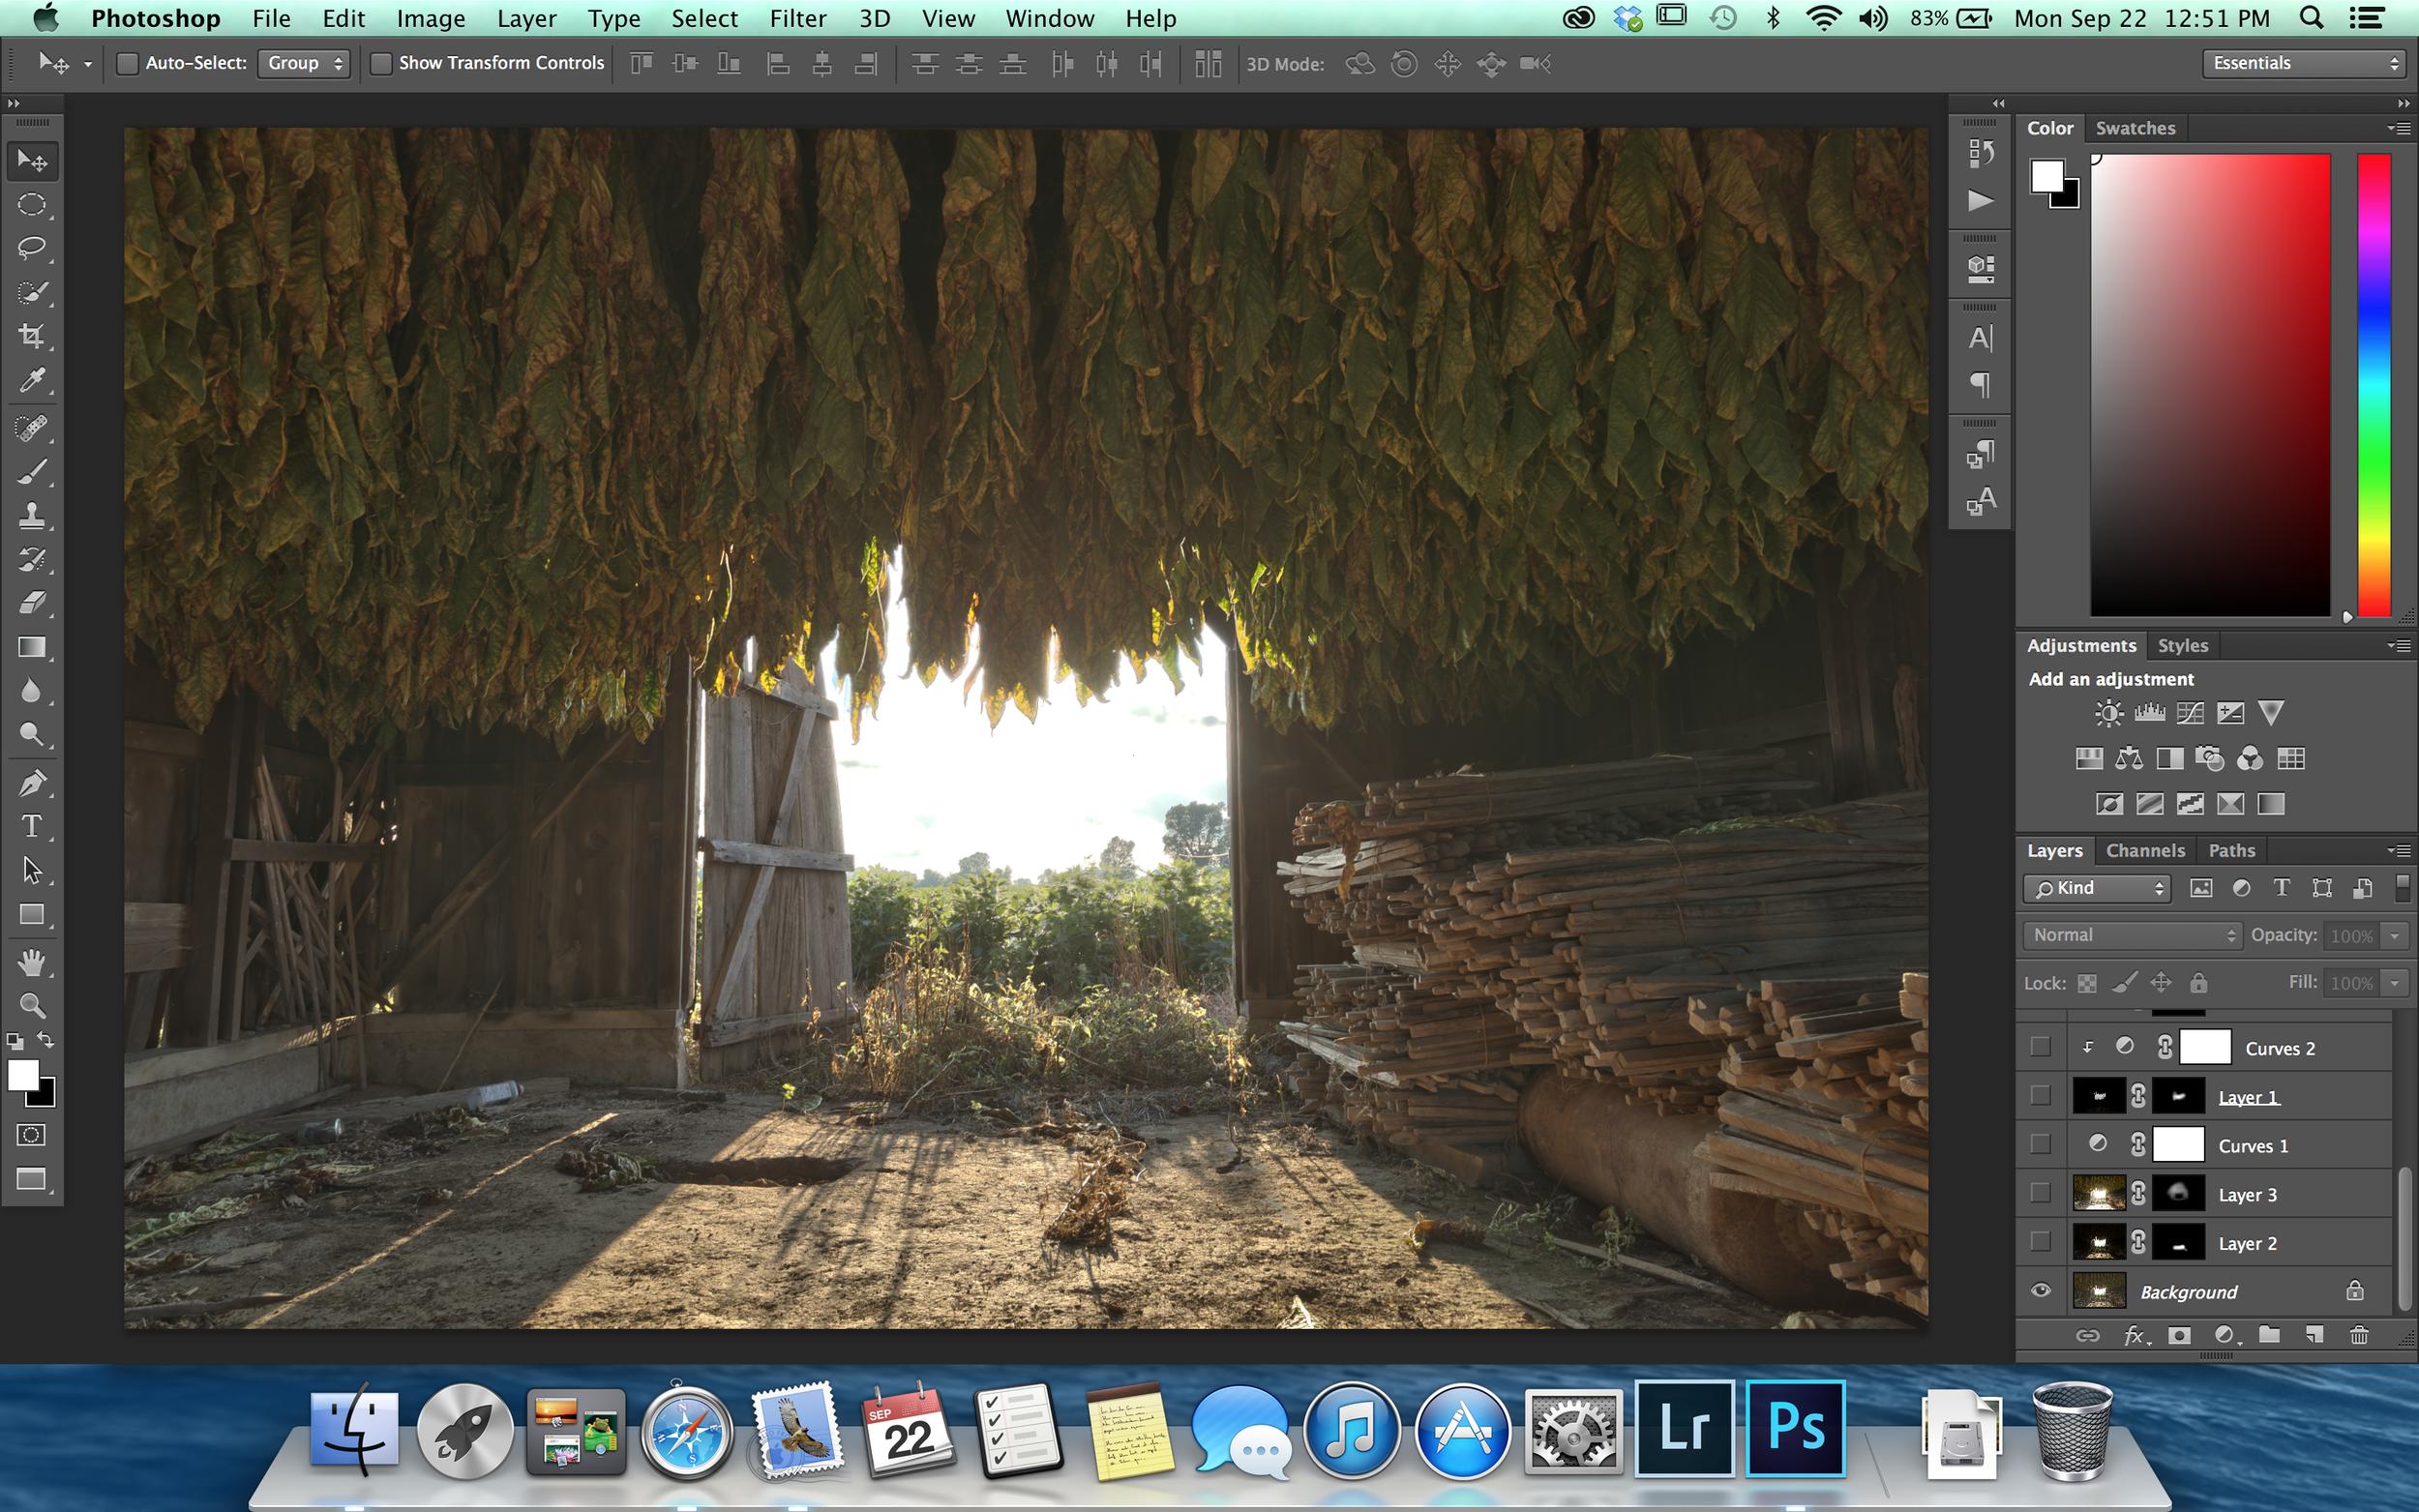 Tobacco Barn HDR beginning